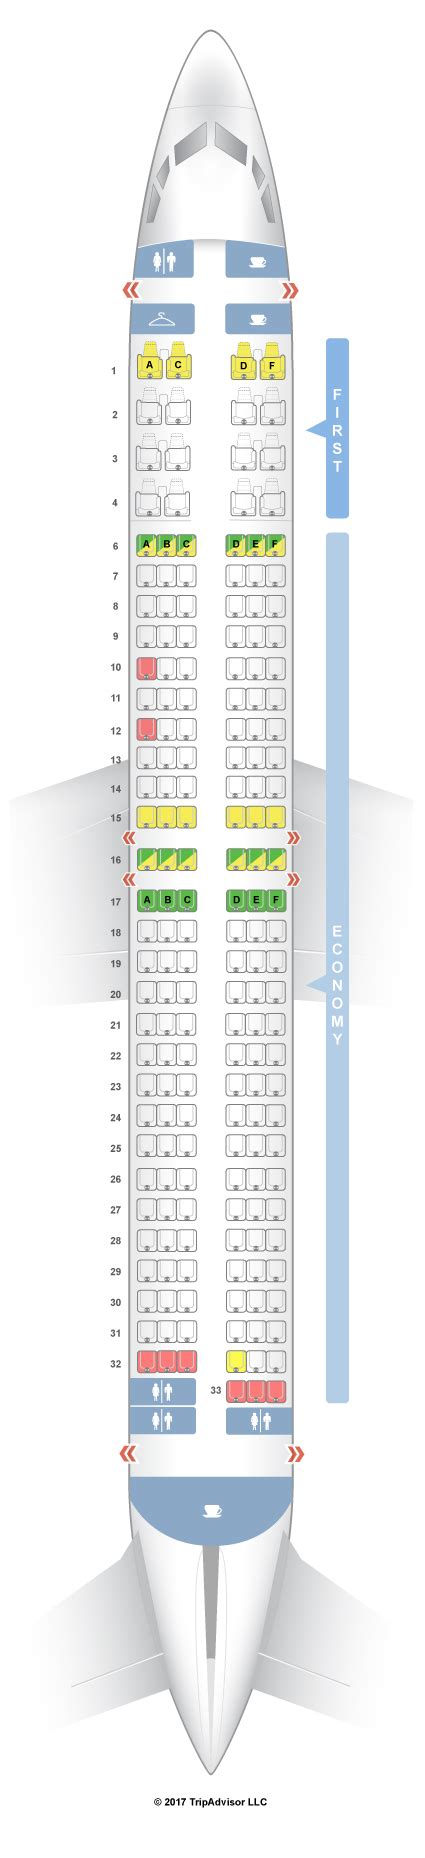 b737 900 config 1 korean air seat maps reviews boeing 737 900 seating chart alaska airlines